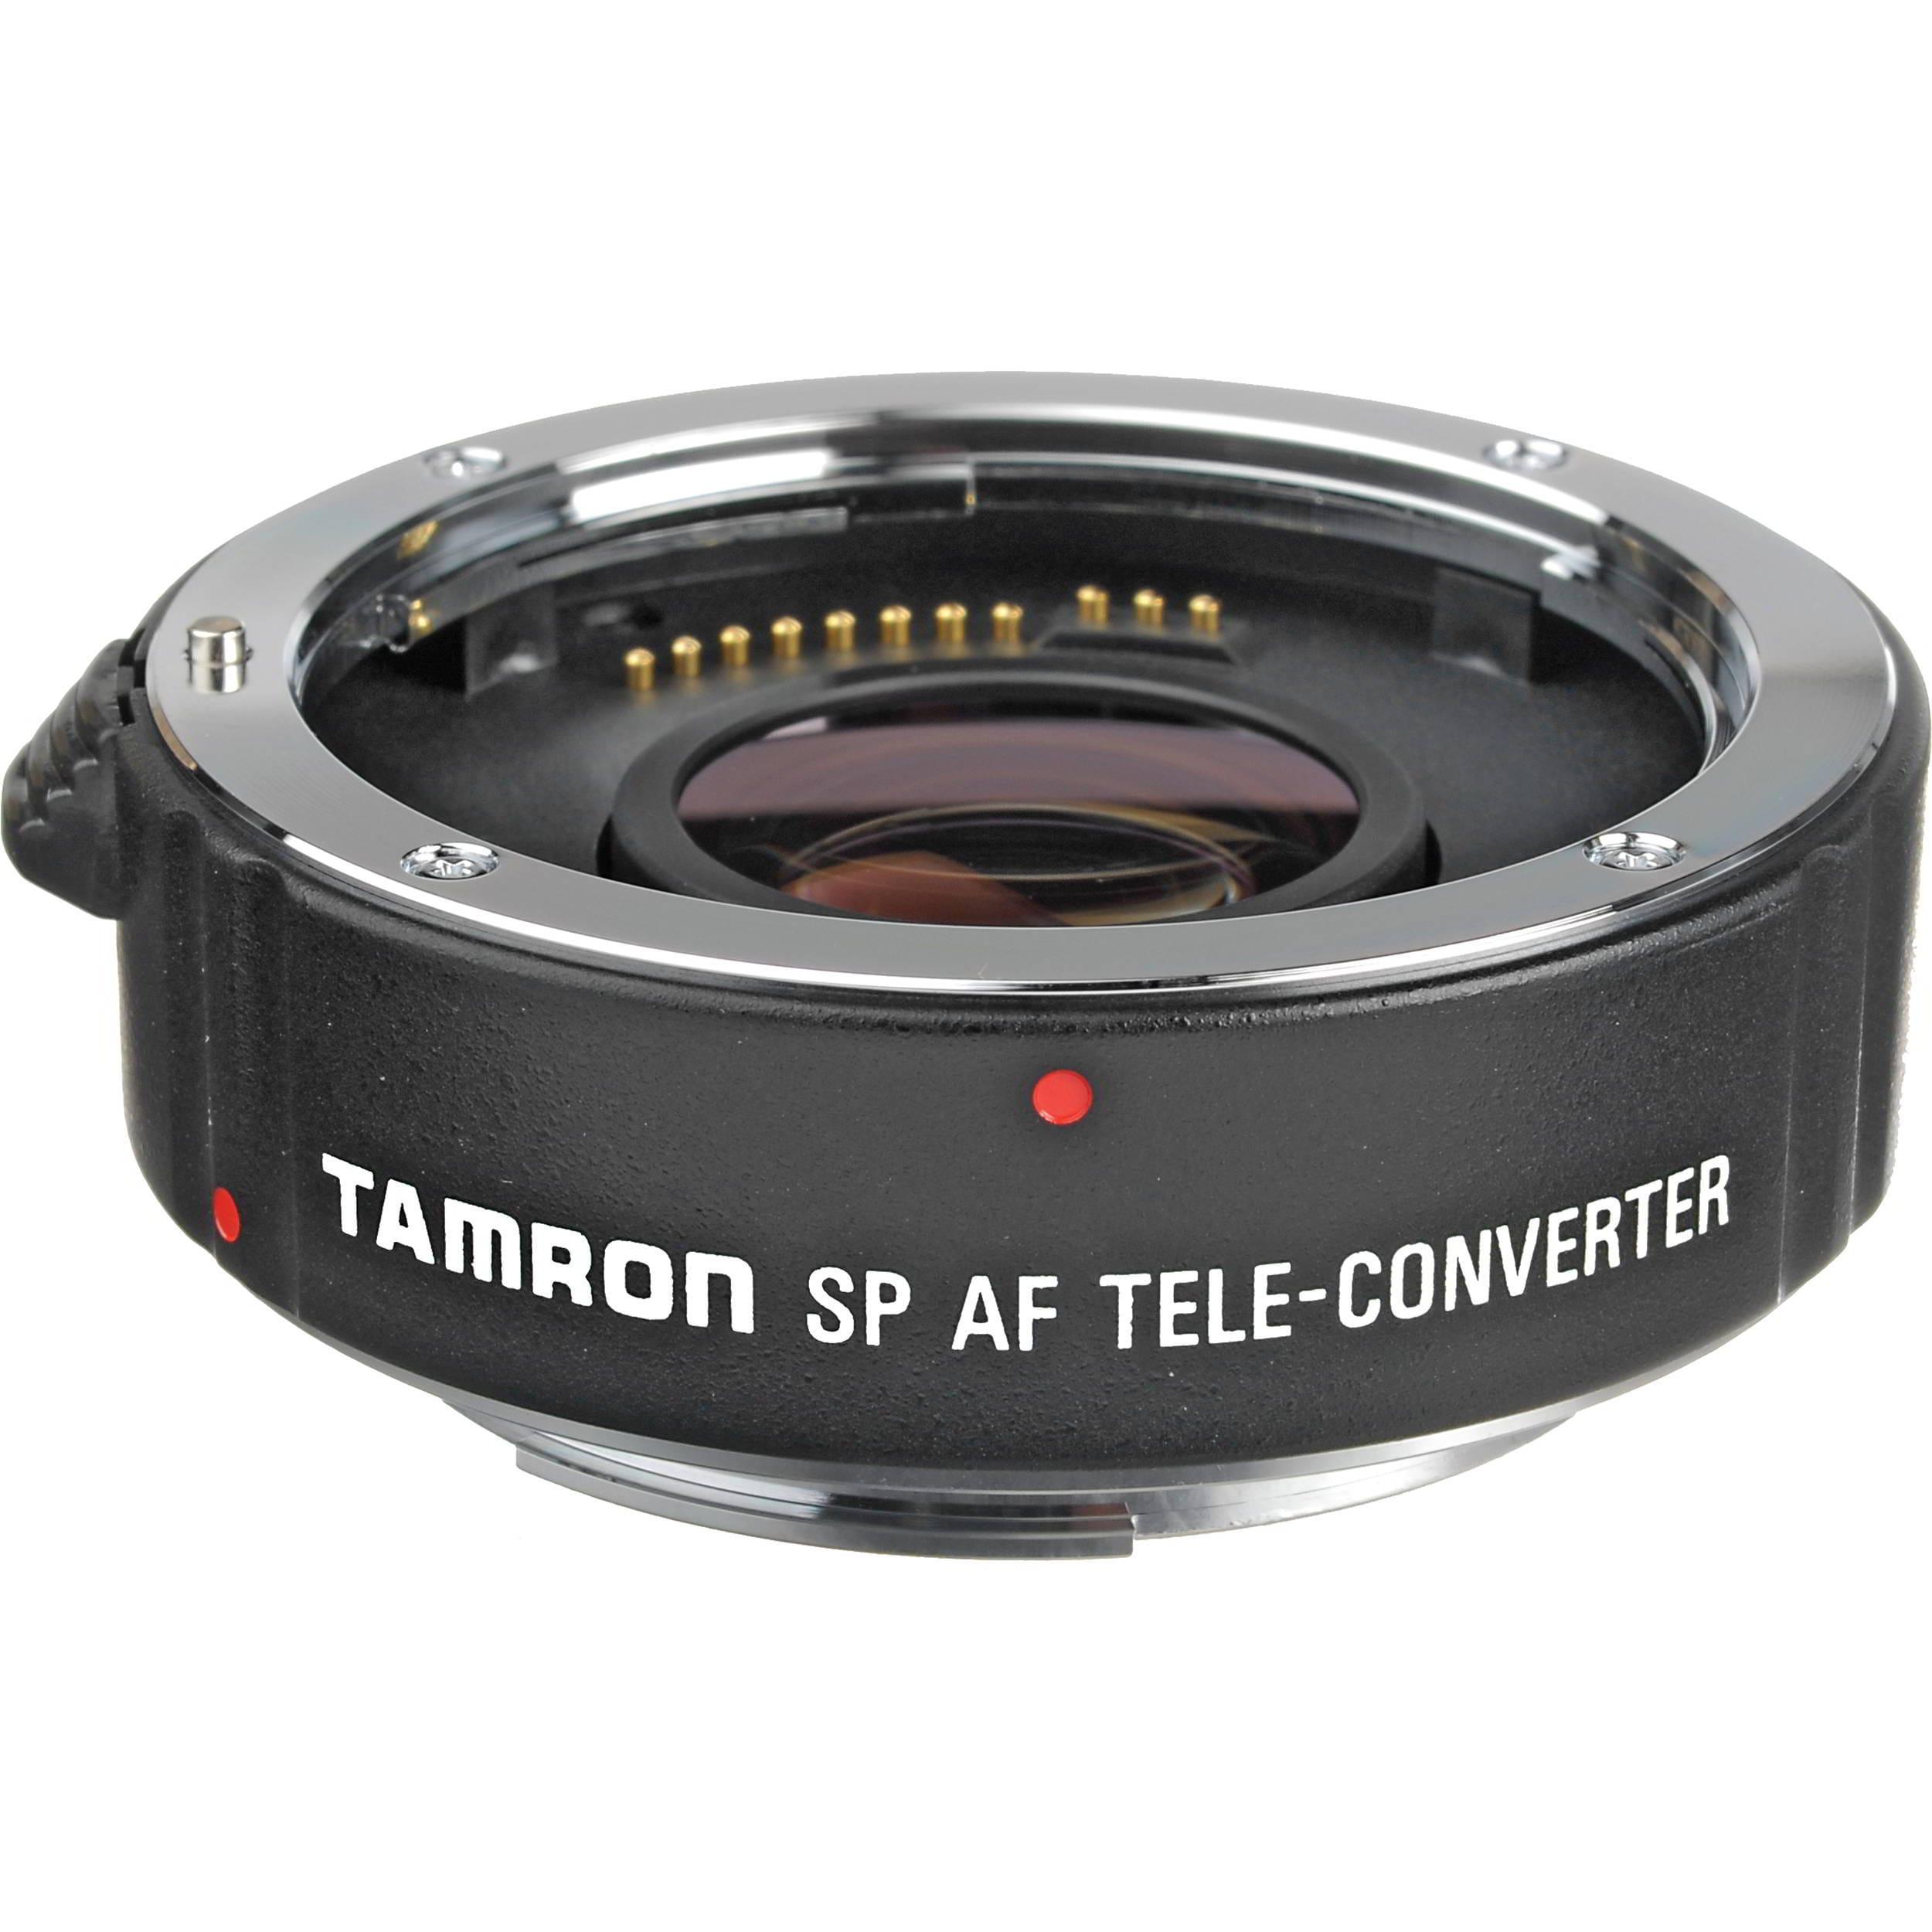 Tele Converter 1,4x for Nikon